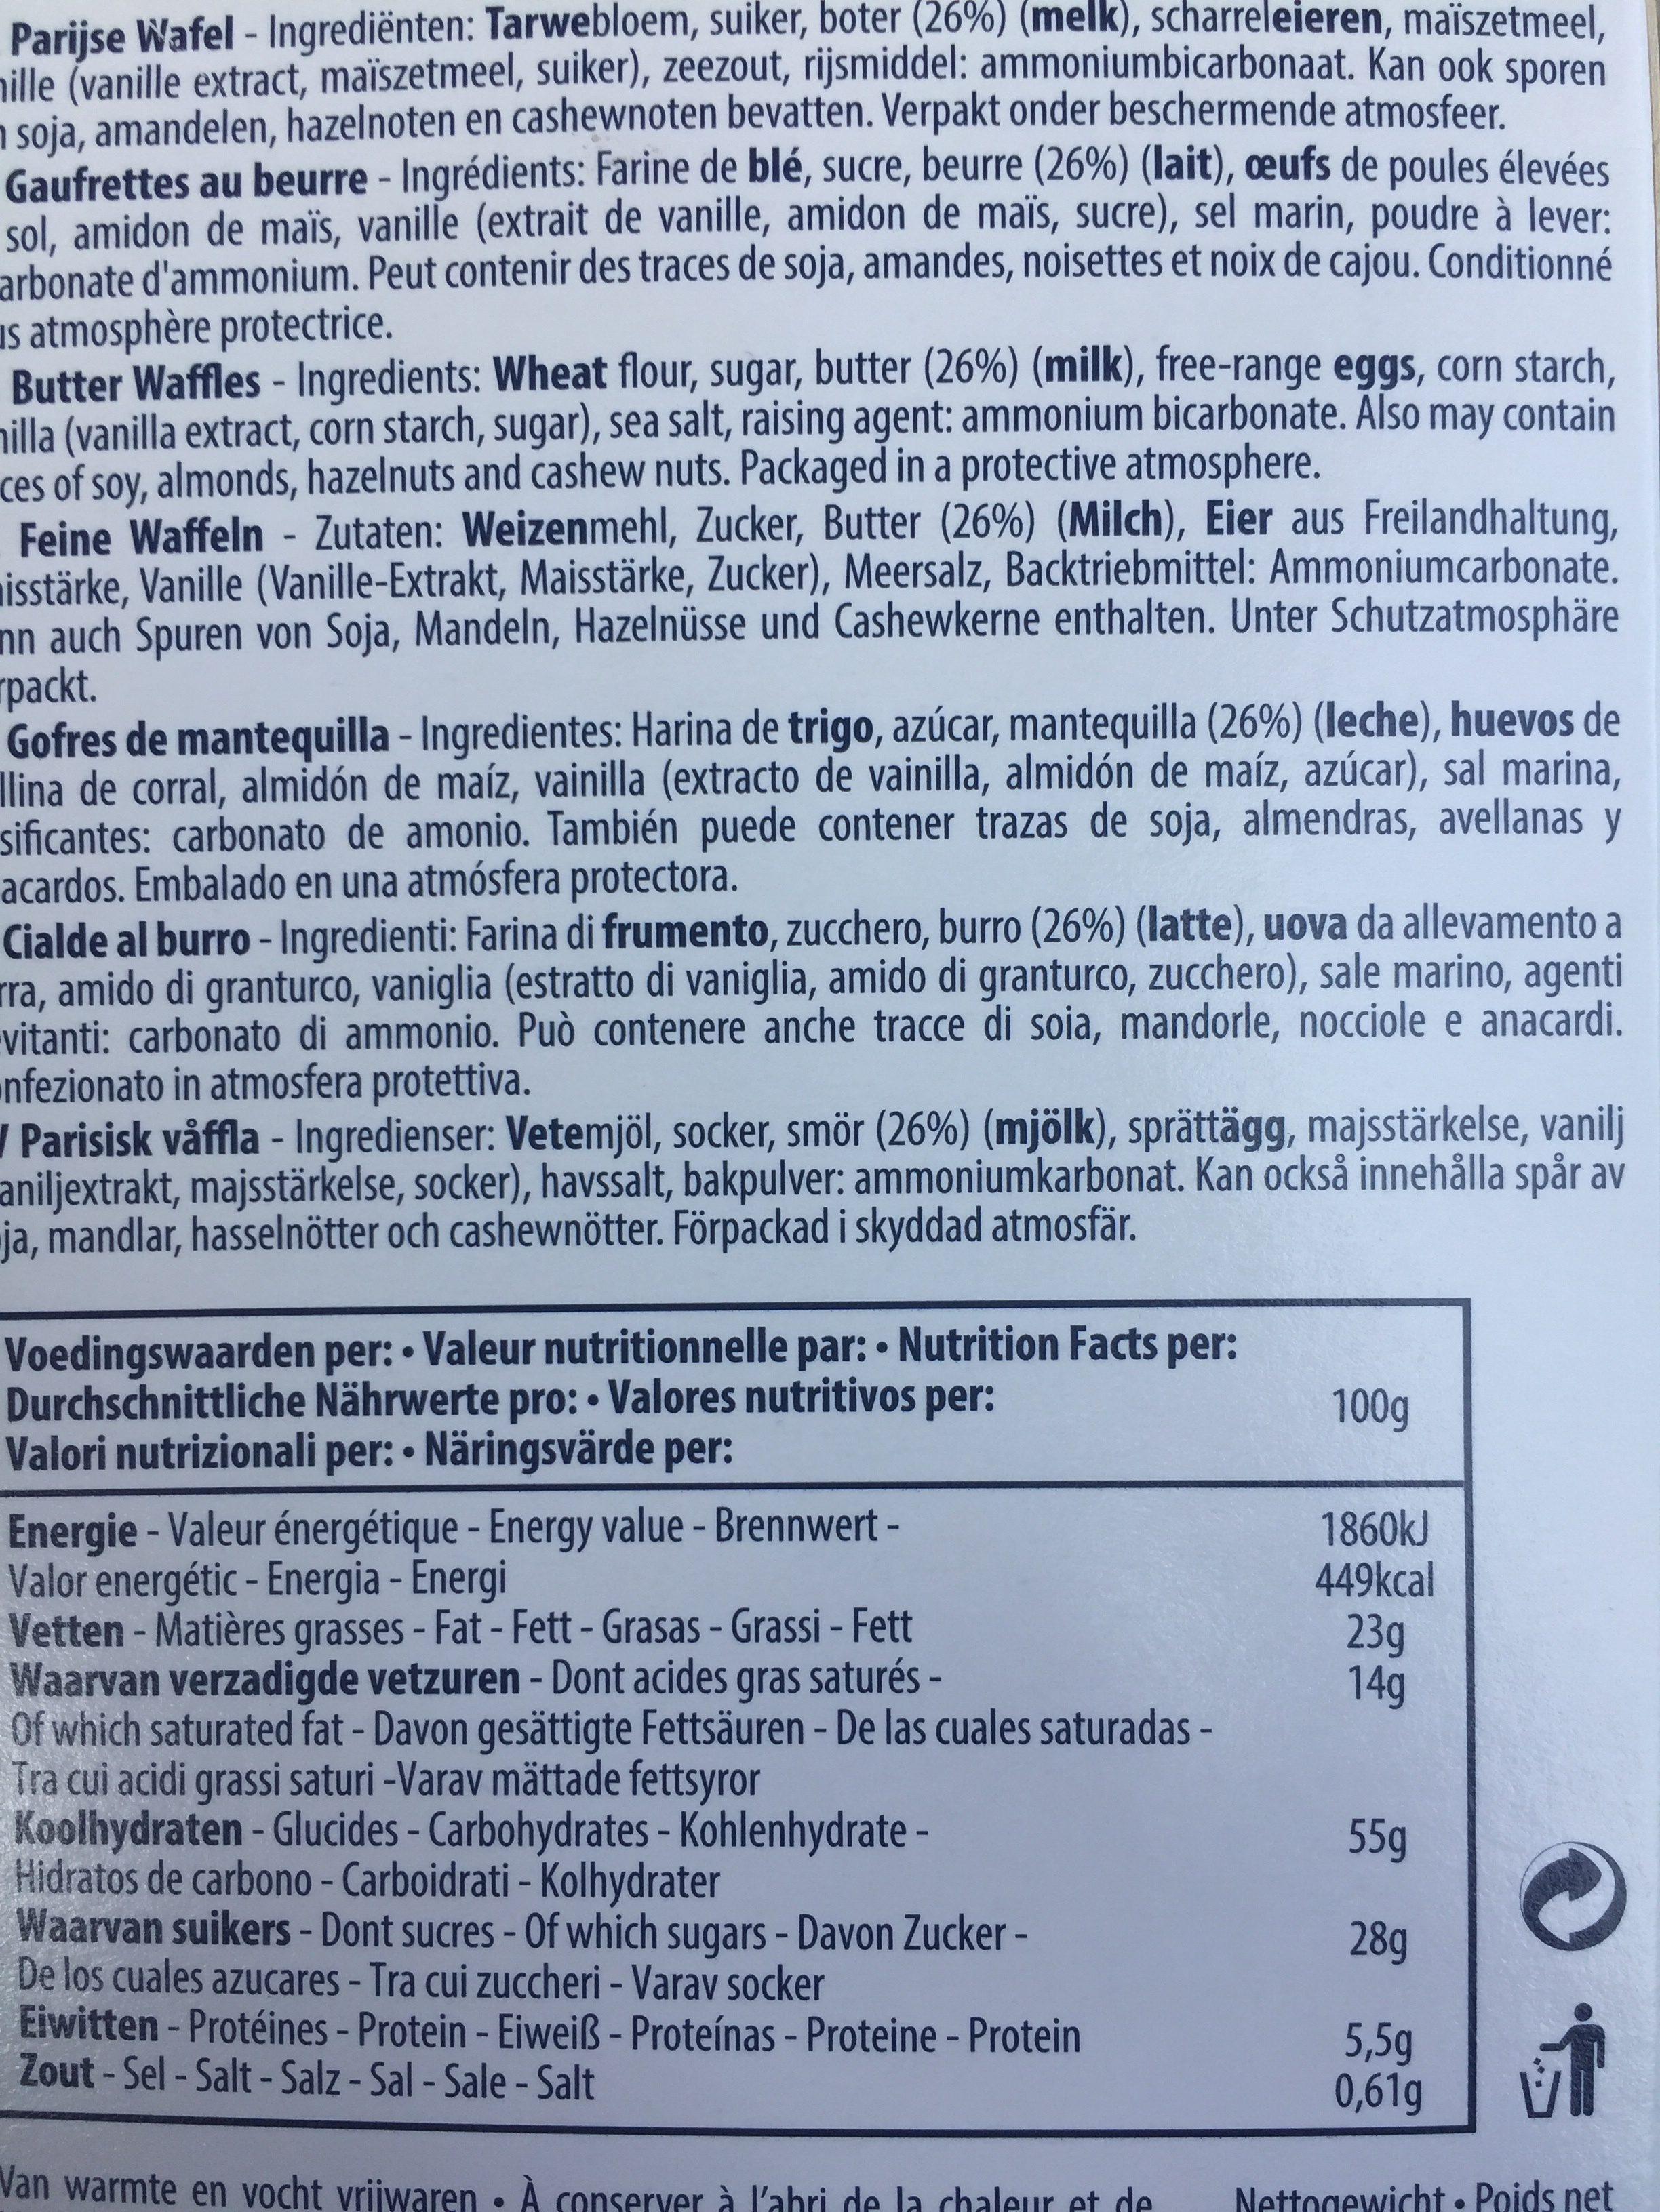 Gaufrettes Au Beurre - Ingredients